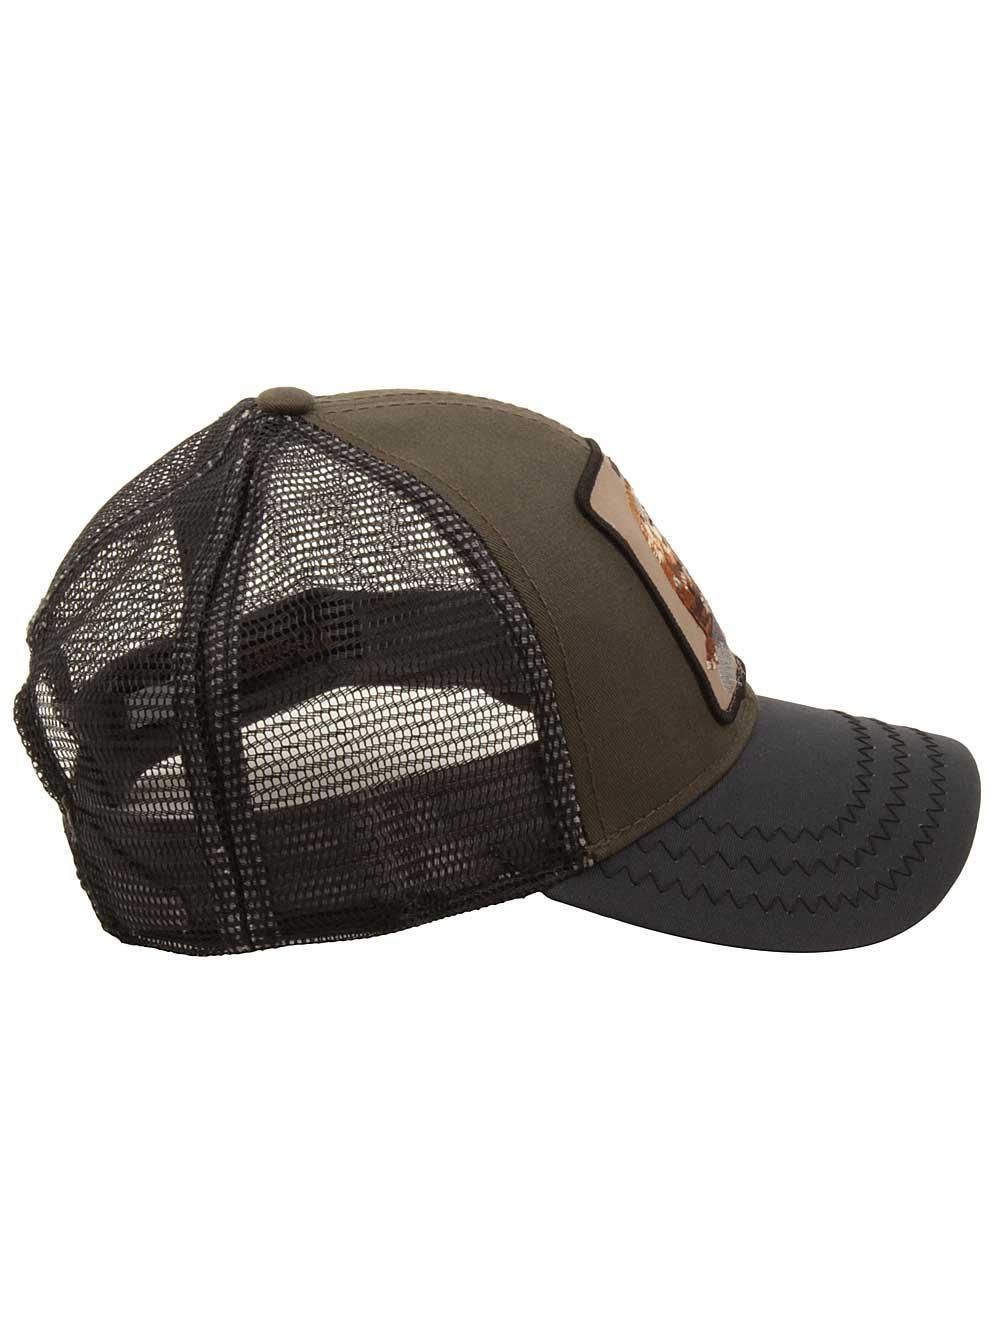 6d8a50cabf259 Goorin Bros - Goorin Bros. Men s Wild Beaver Hat in Olive - Walmart.com